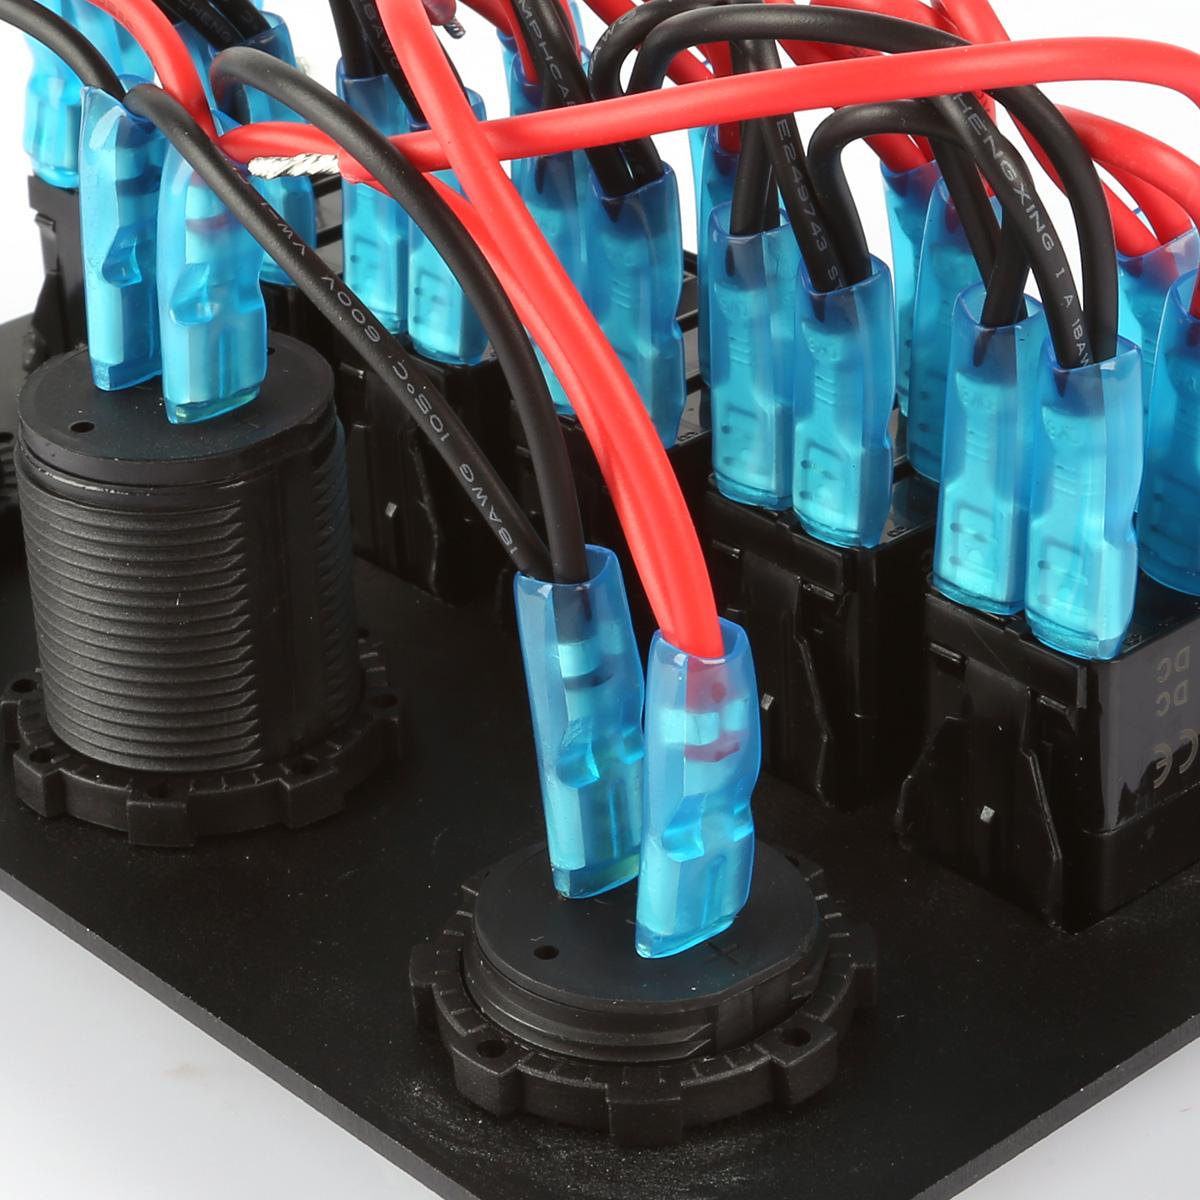 6 gang led schaltpaneel sicherung schalter schalttaf. Black Bedroom Furniture Sets. Home Design Ideas